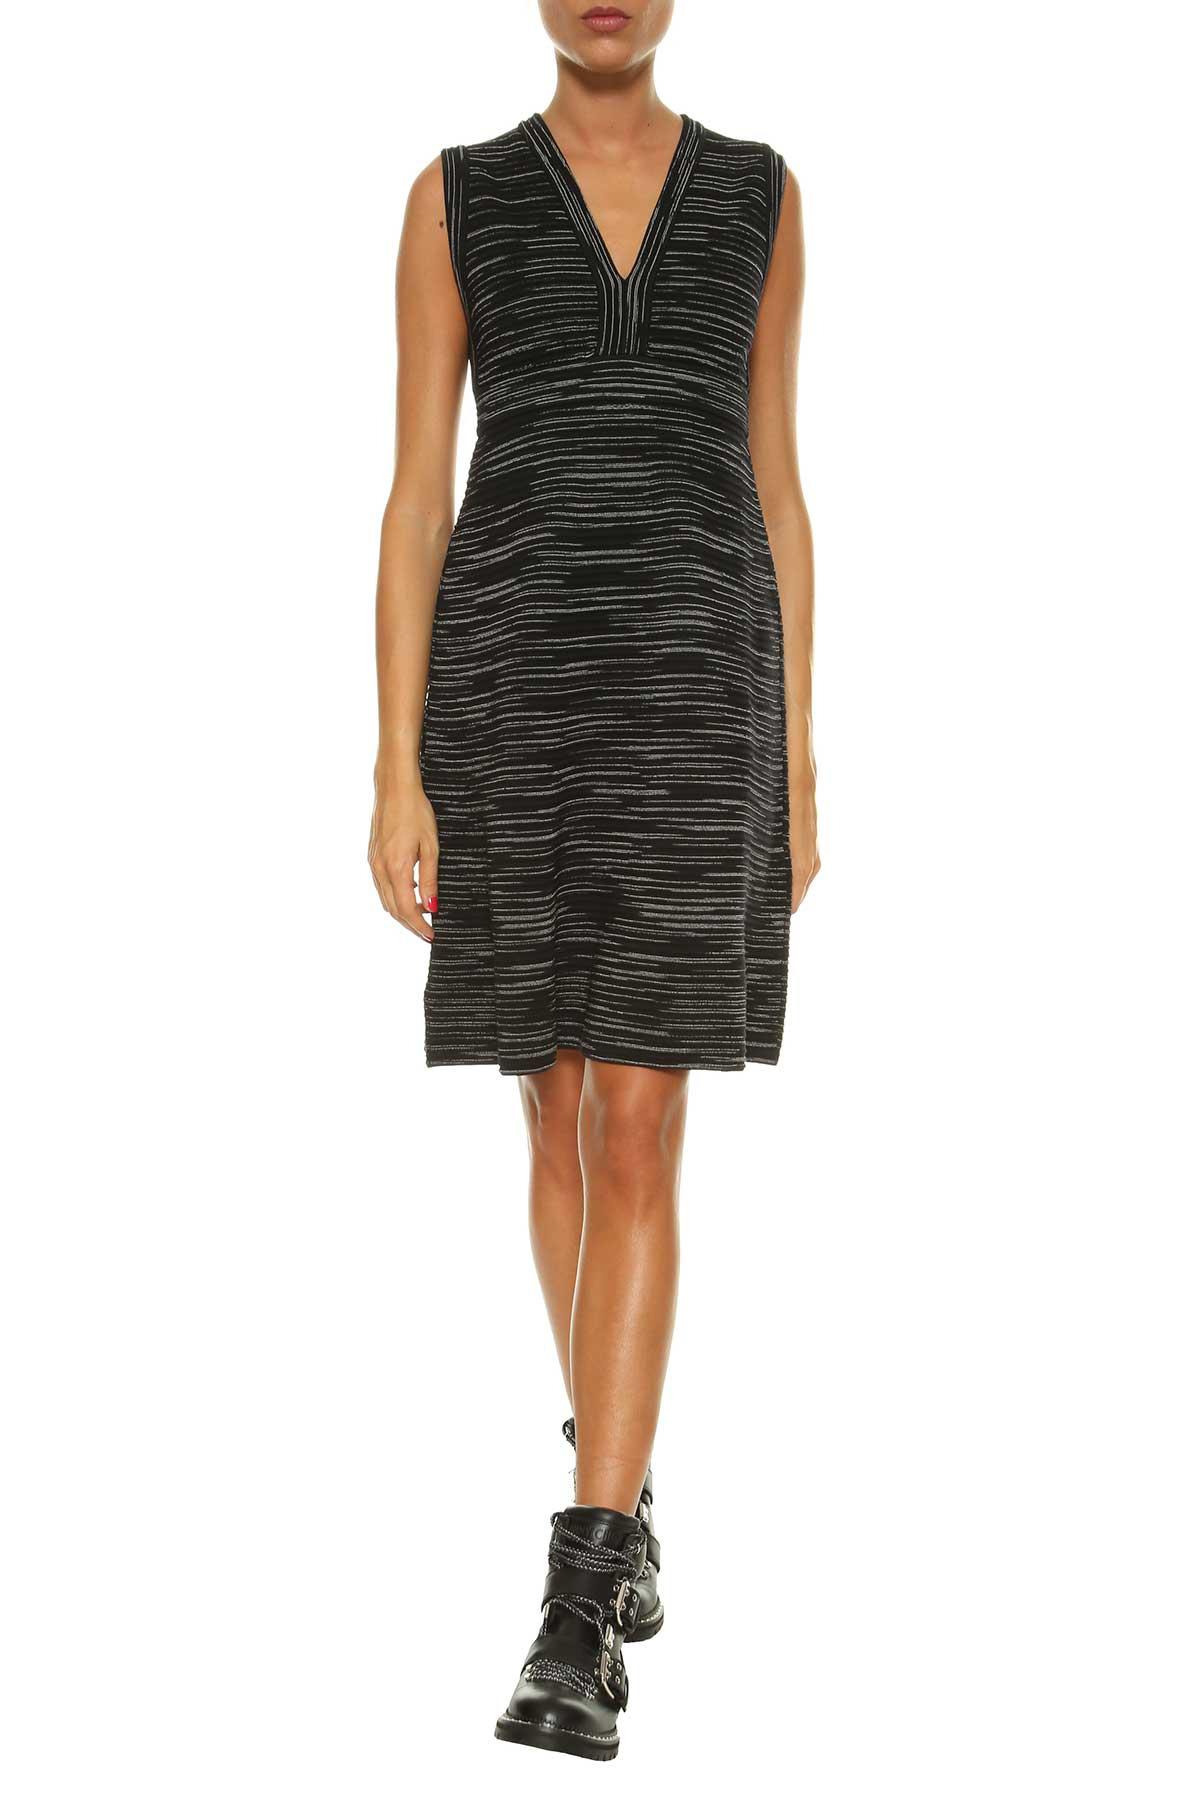 M Missoni Heavy Jersey Short Dress